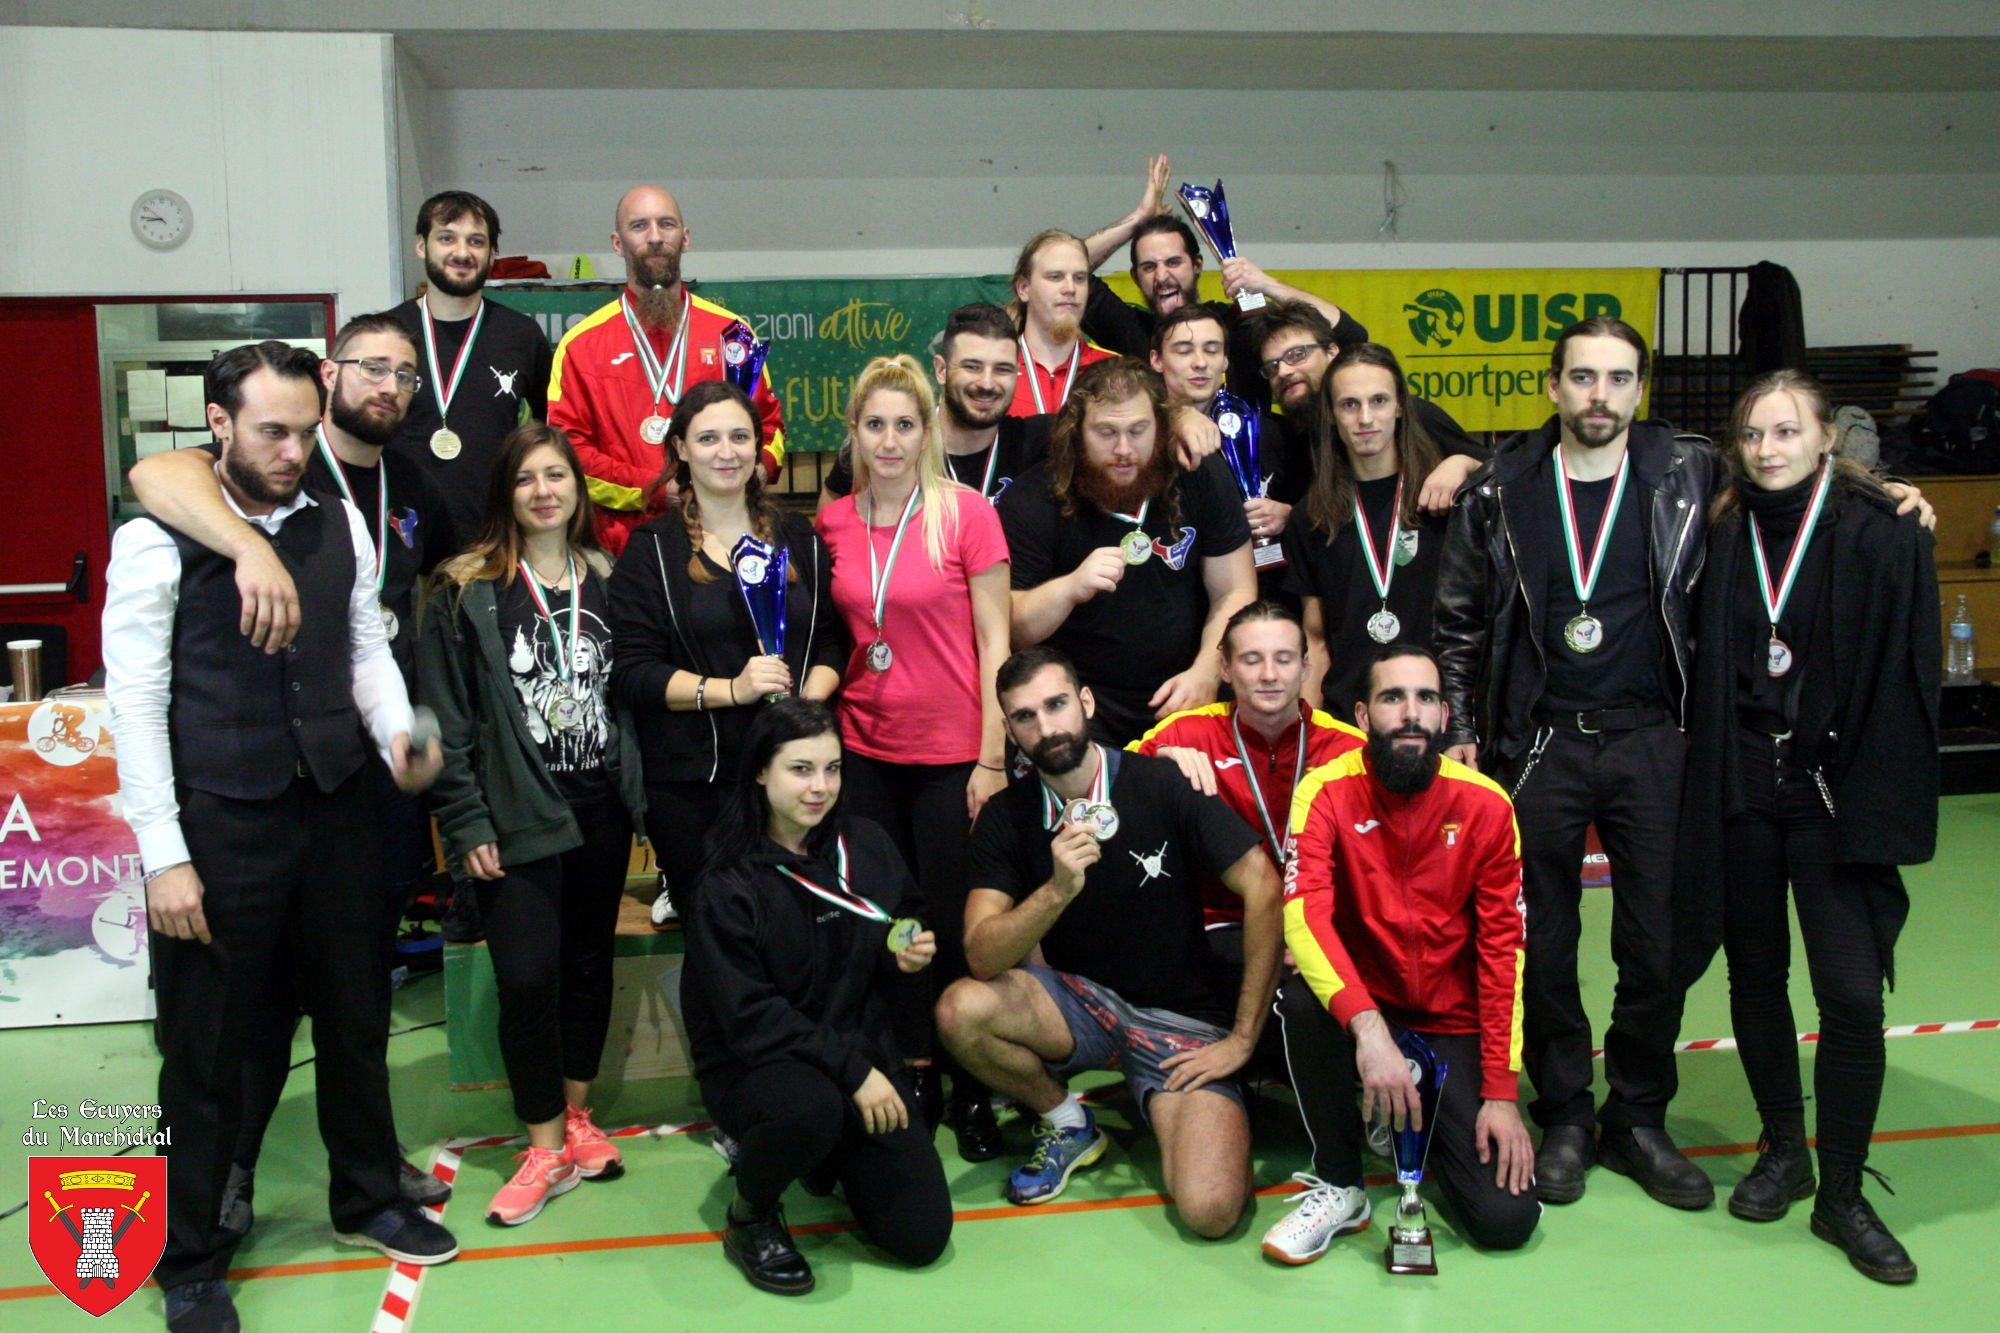 2017-11-17-Tournoi-MSF-Turin-17-marchidial.fr_